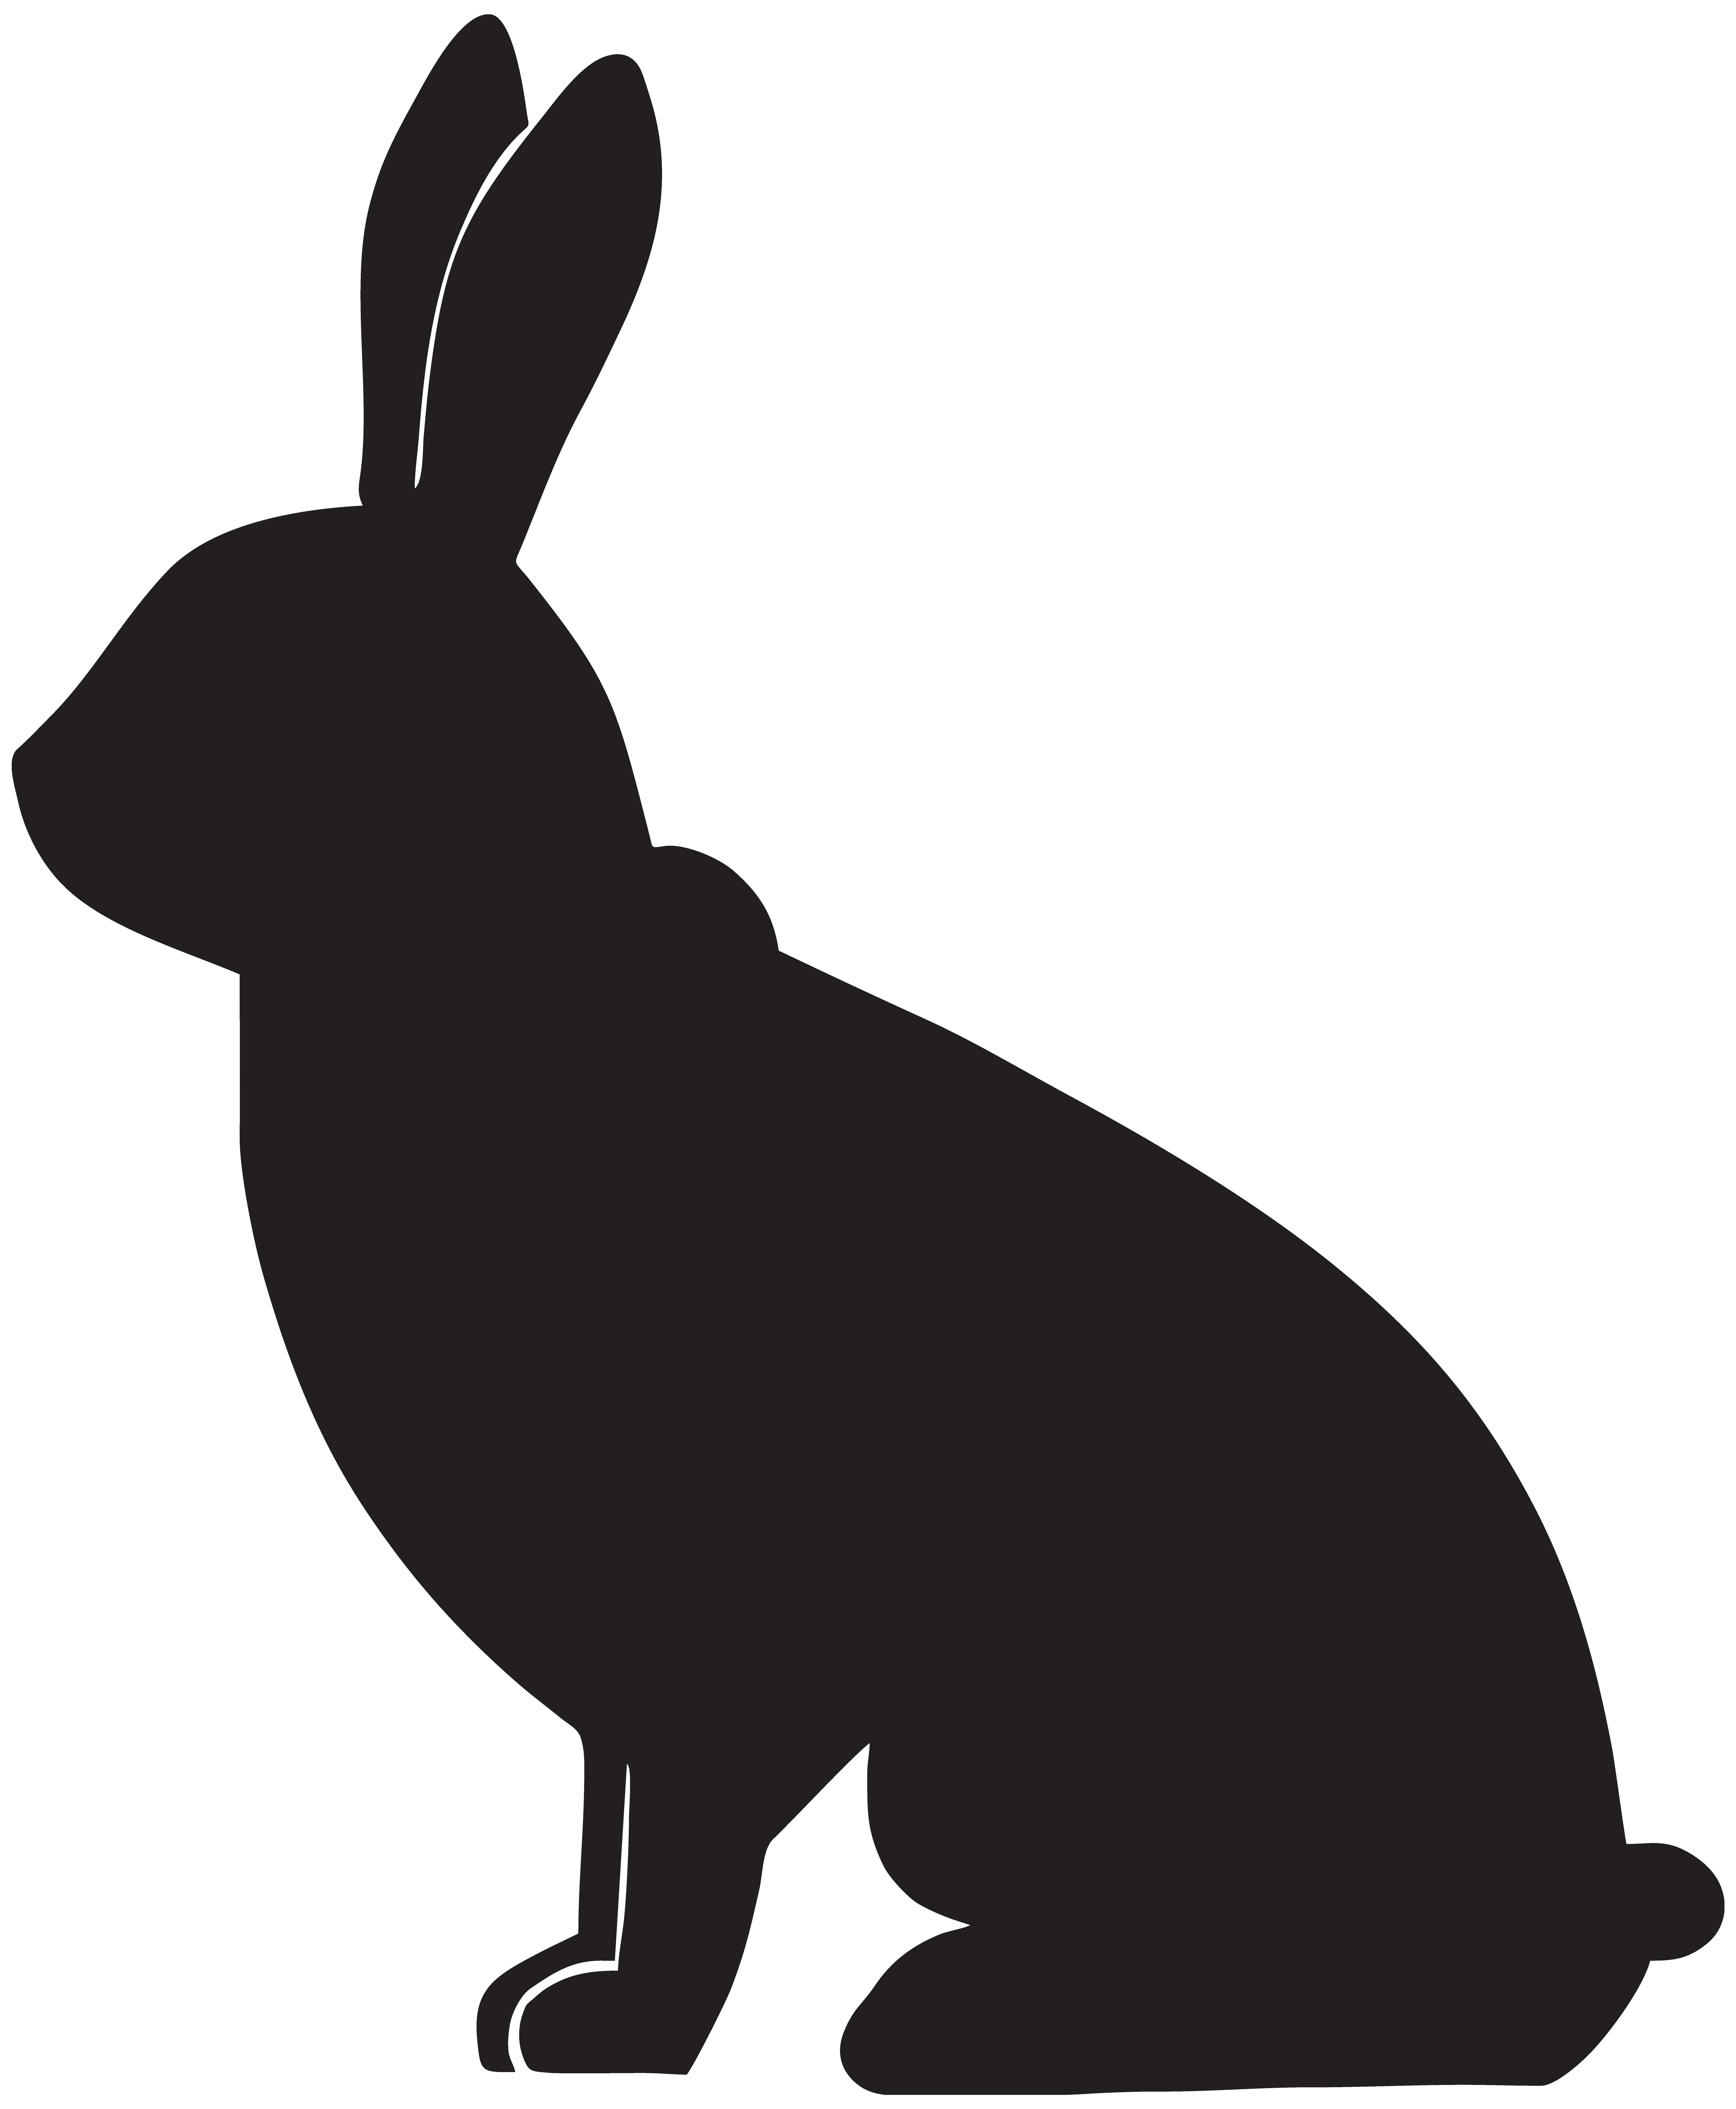 6586x8000 Rabbit Silhouette Png Clip Art Imageu200b Gallery Yopriceville